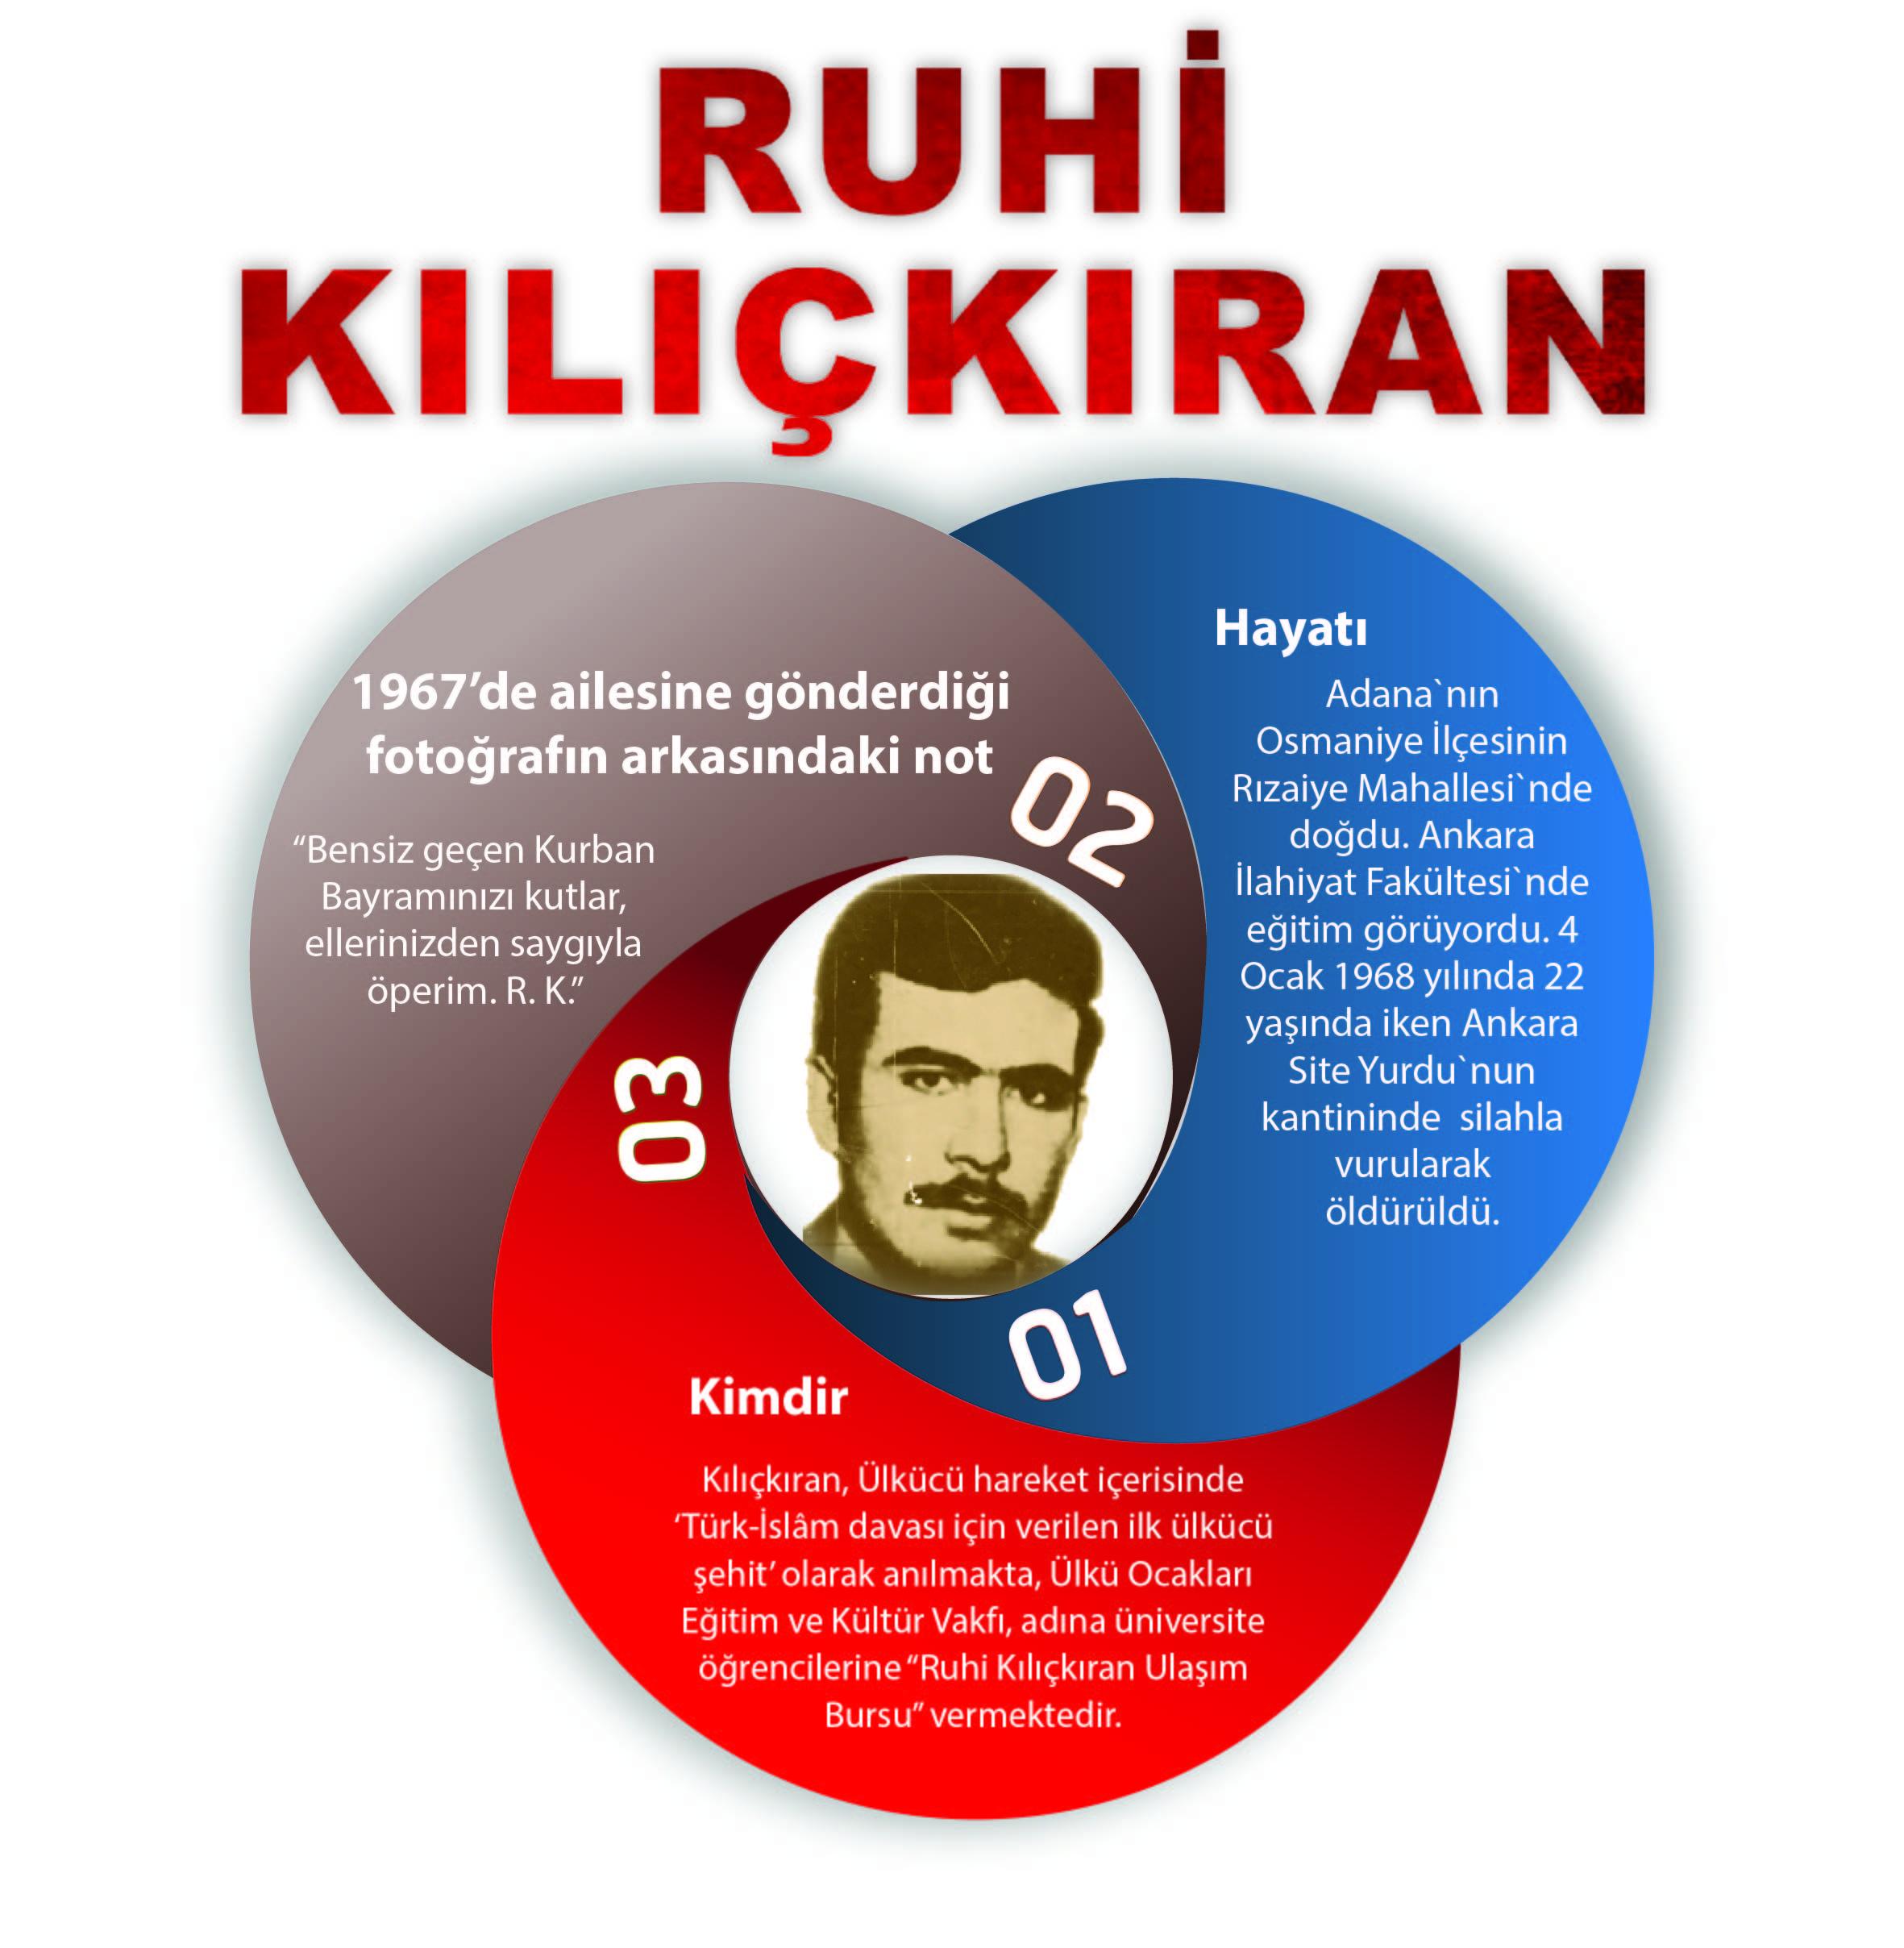 ruhi_infografik_son.jpg